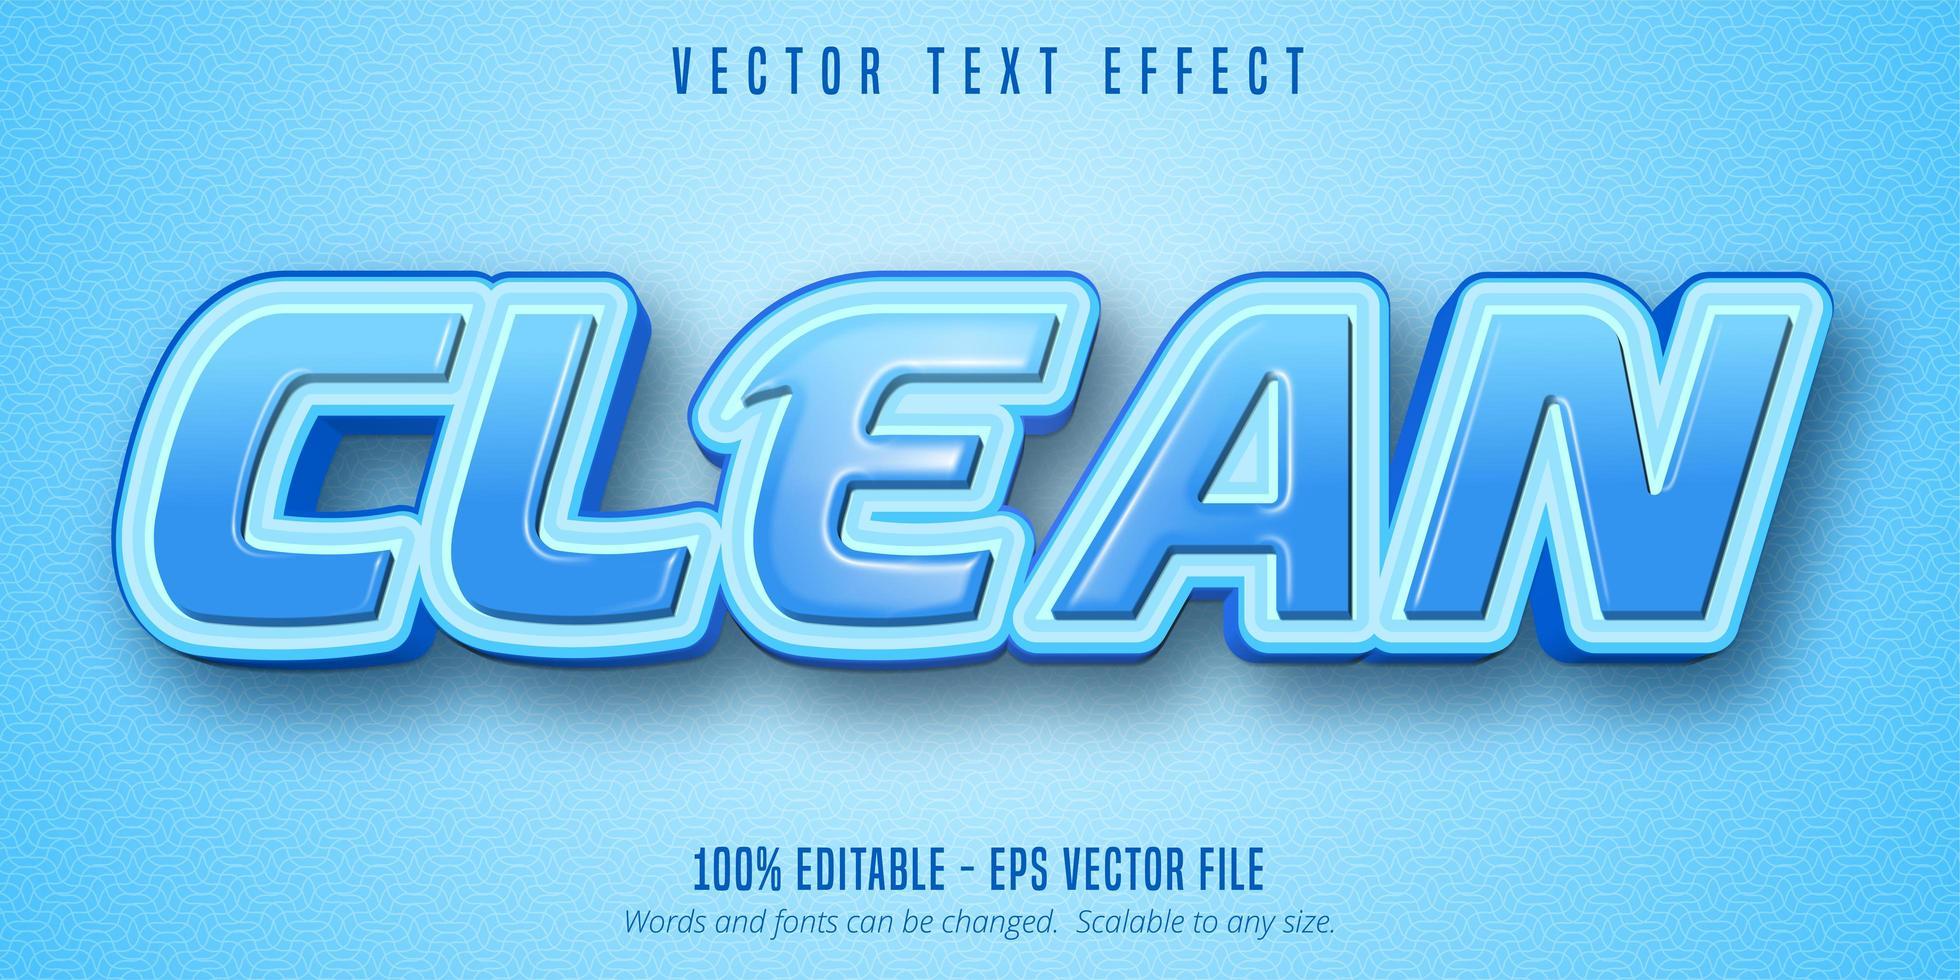 efecto de texto contorneado azul brillante limpio vector